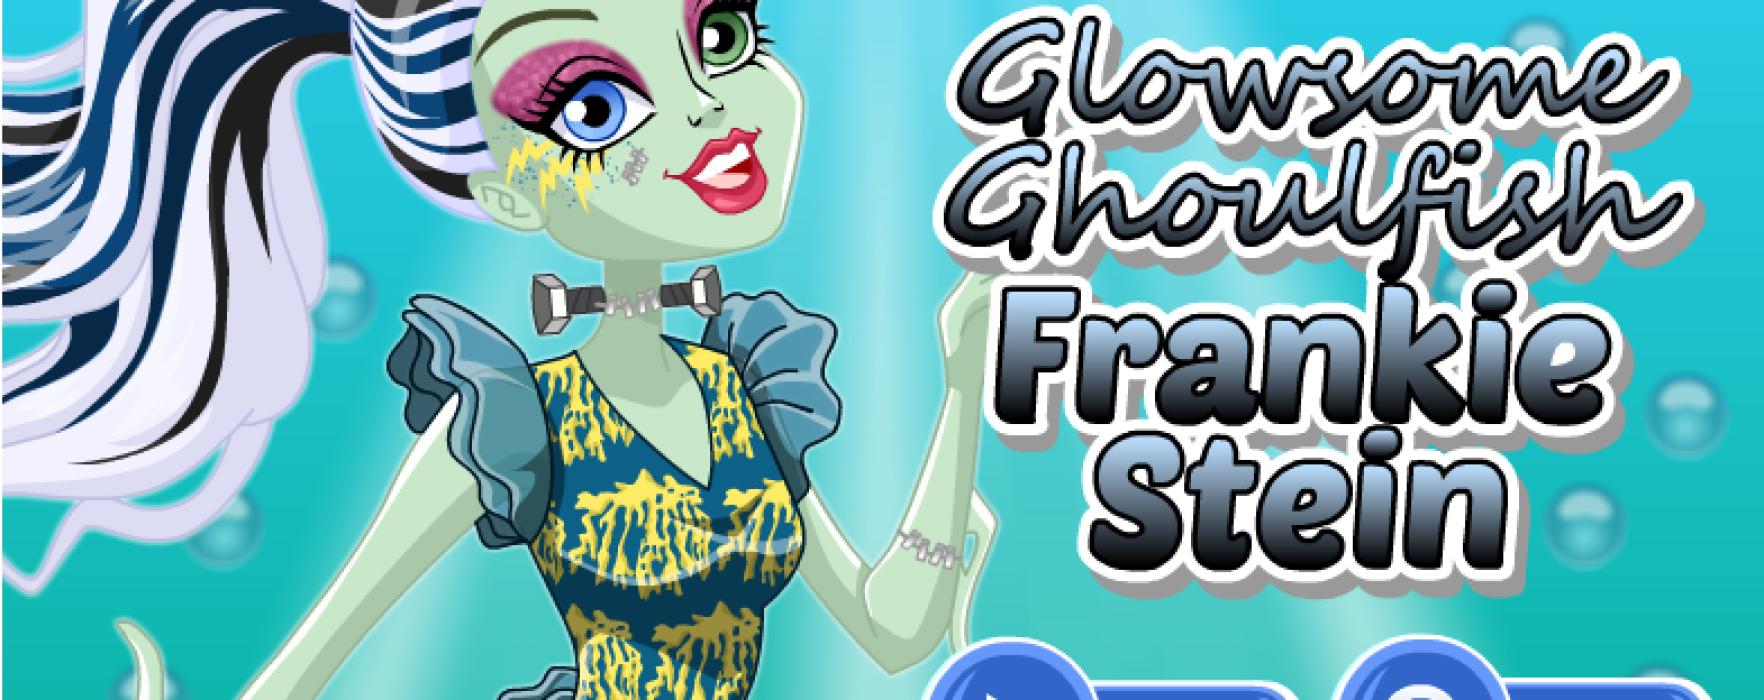 Одевалка Френки Штейн «Great Scarrier Reef / Glowsome Ghoulfish» — игры Monster High